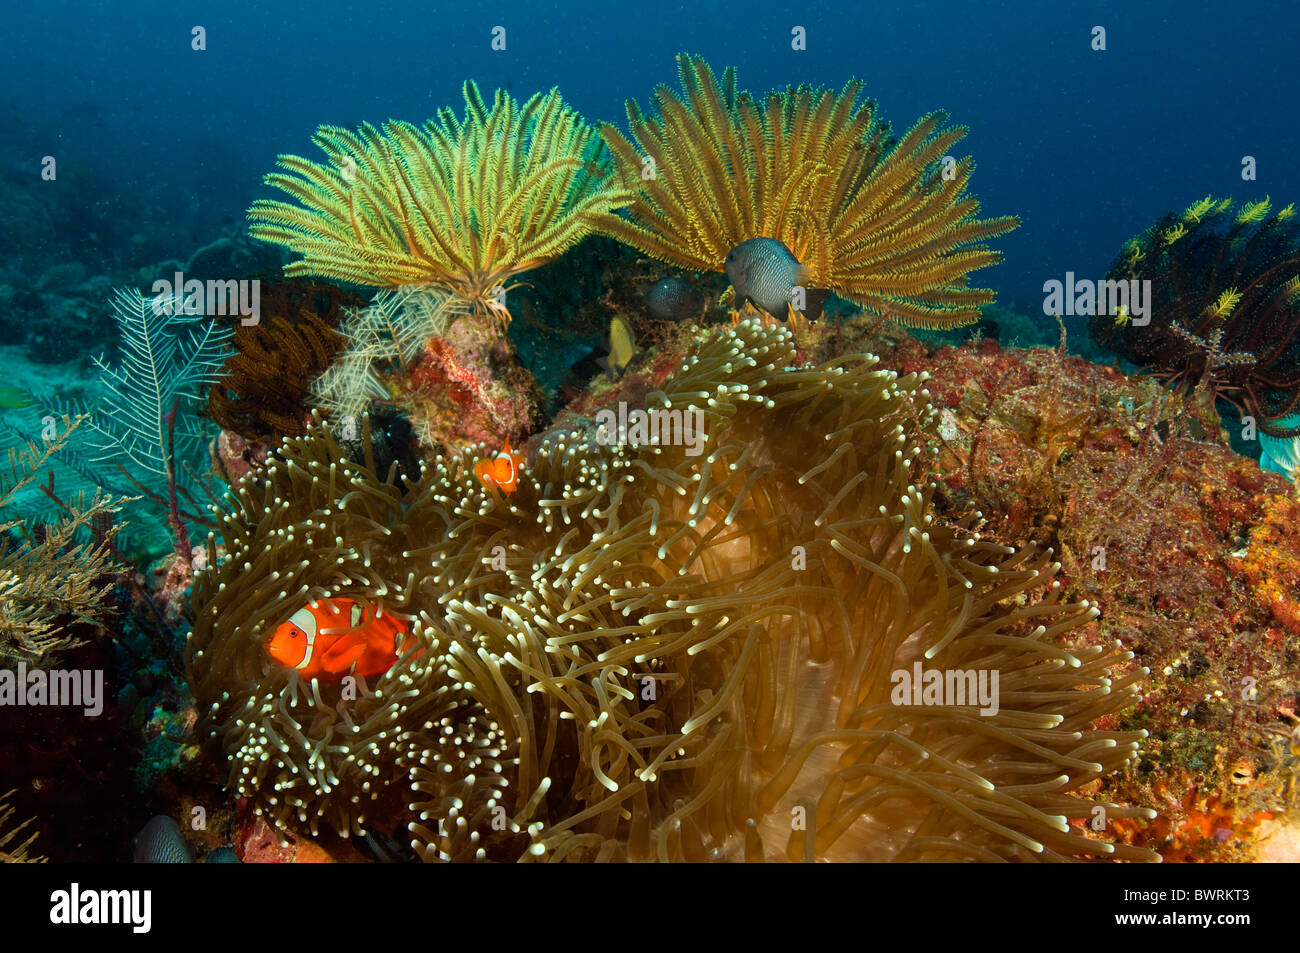 Korallenriff-Szene und Wirbelsäule Wange Anemonefishes, Raja Ampat, Indonesien Stockbild